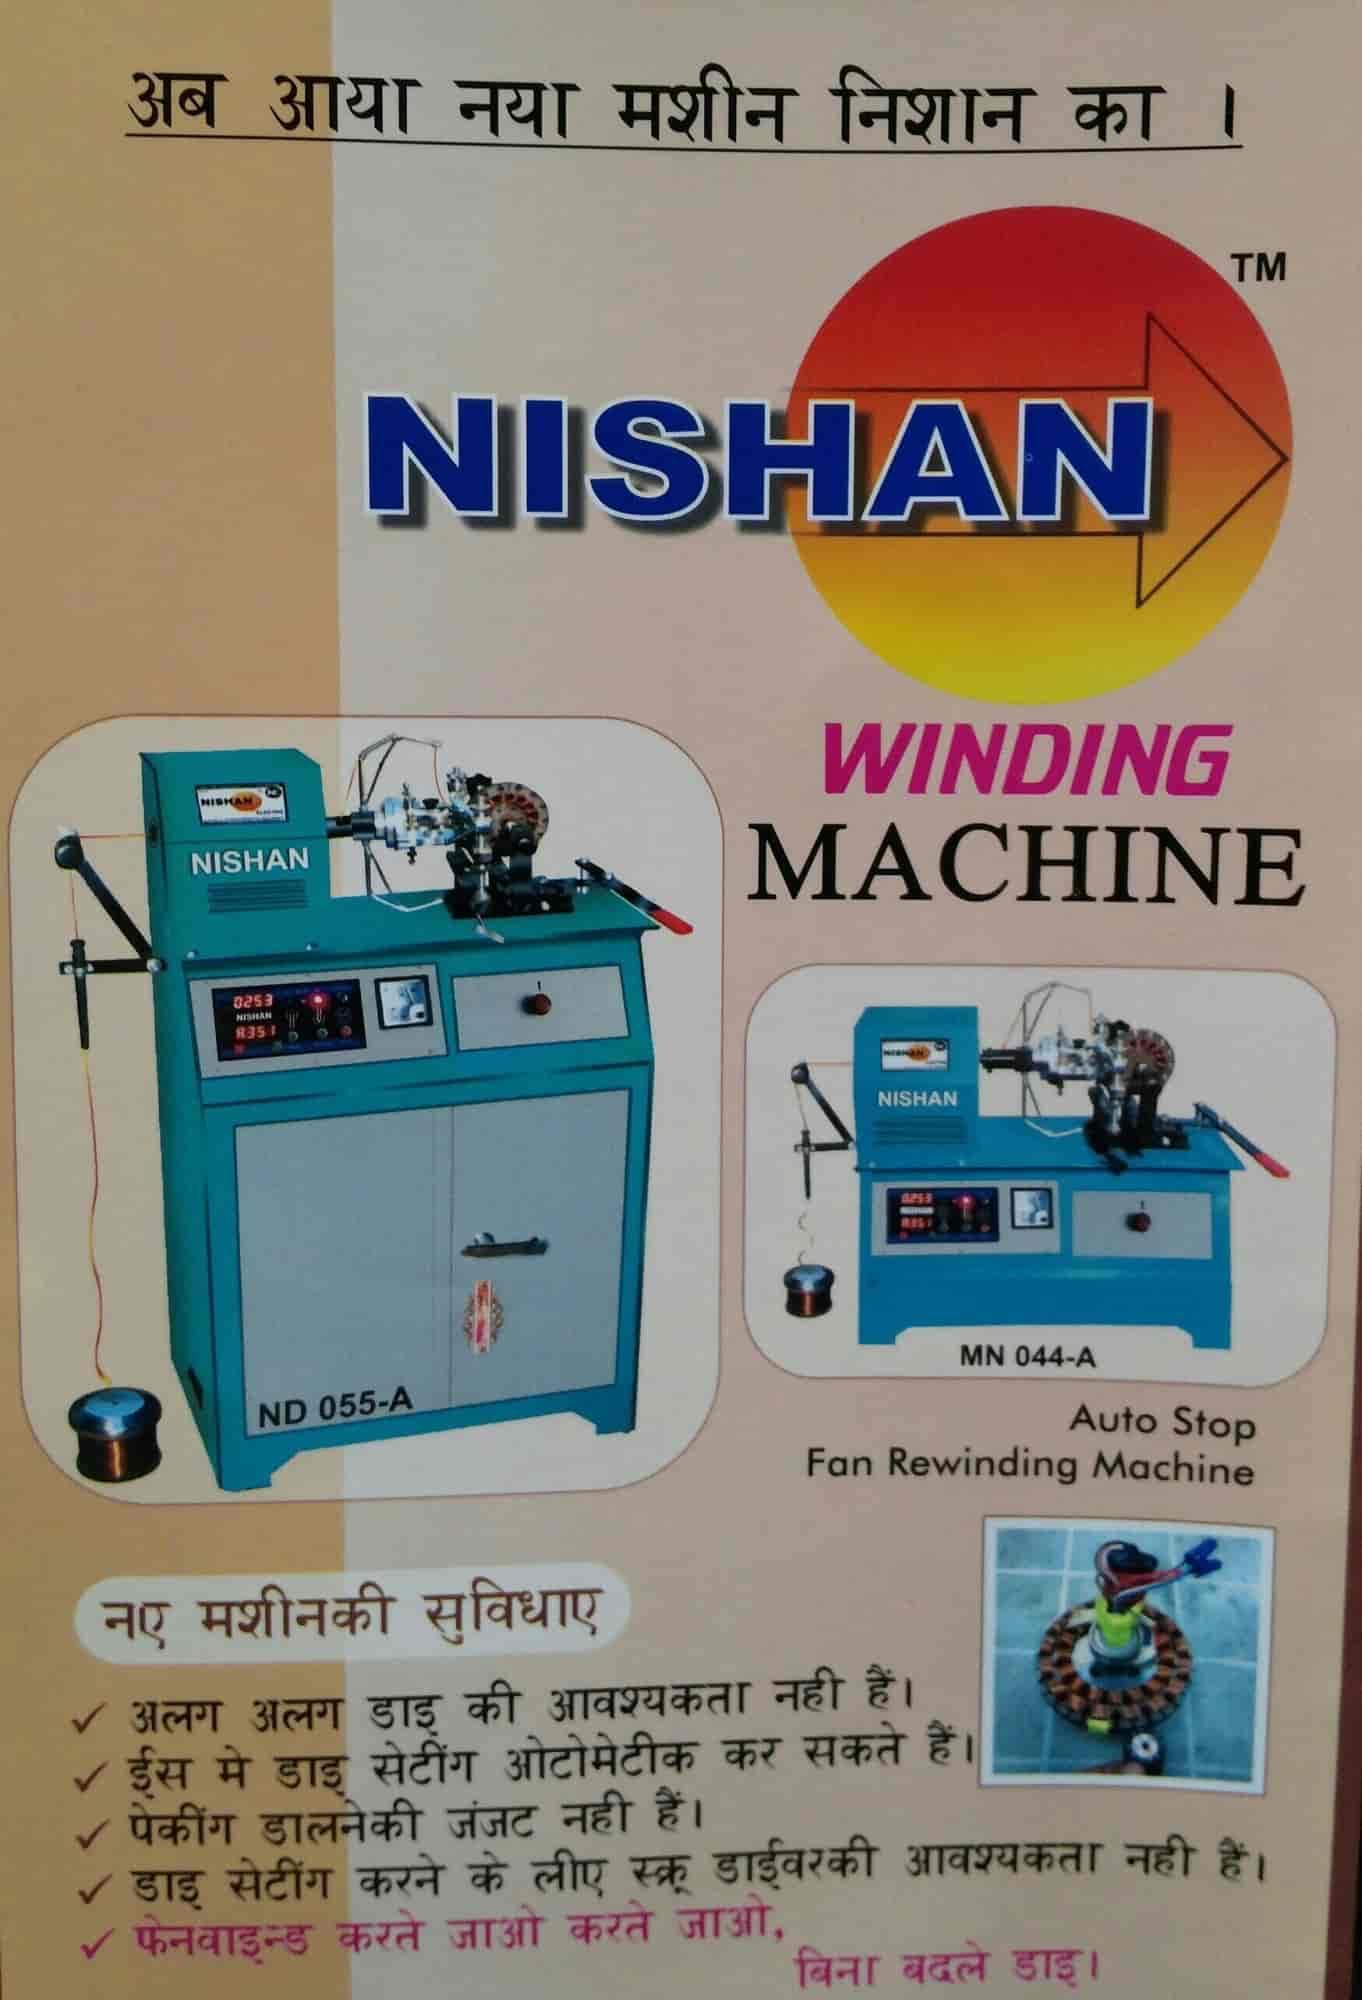 Nishan Electric Photos, Bapunagar, Ahmedabad- Pictures & Images ...